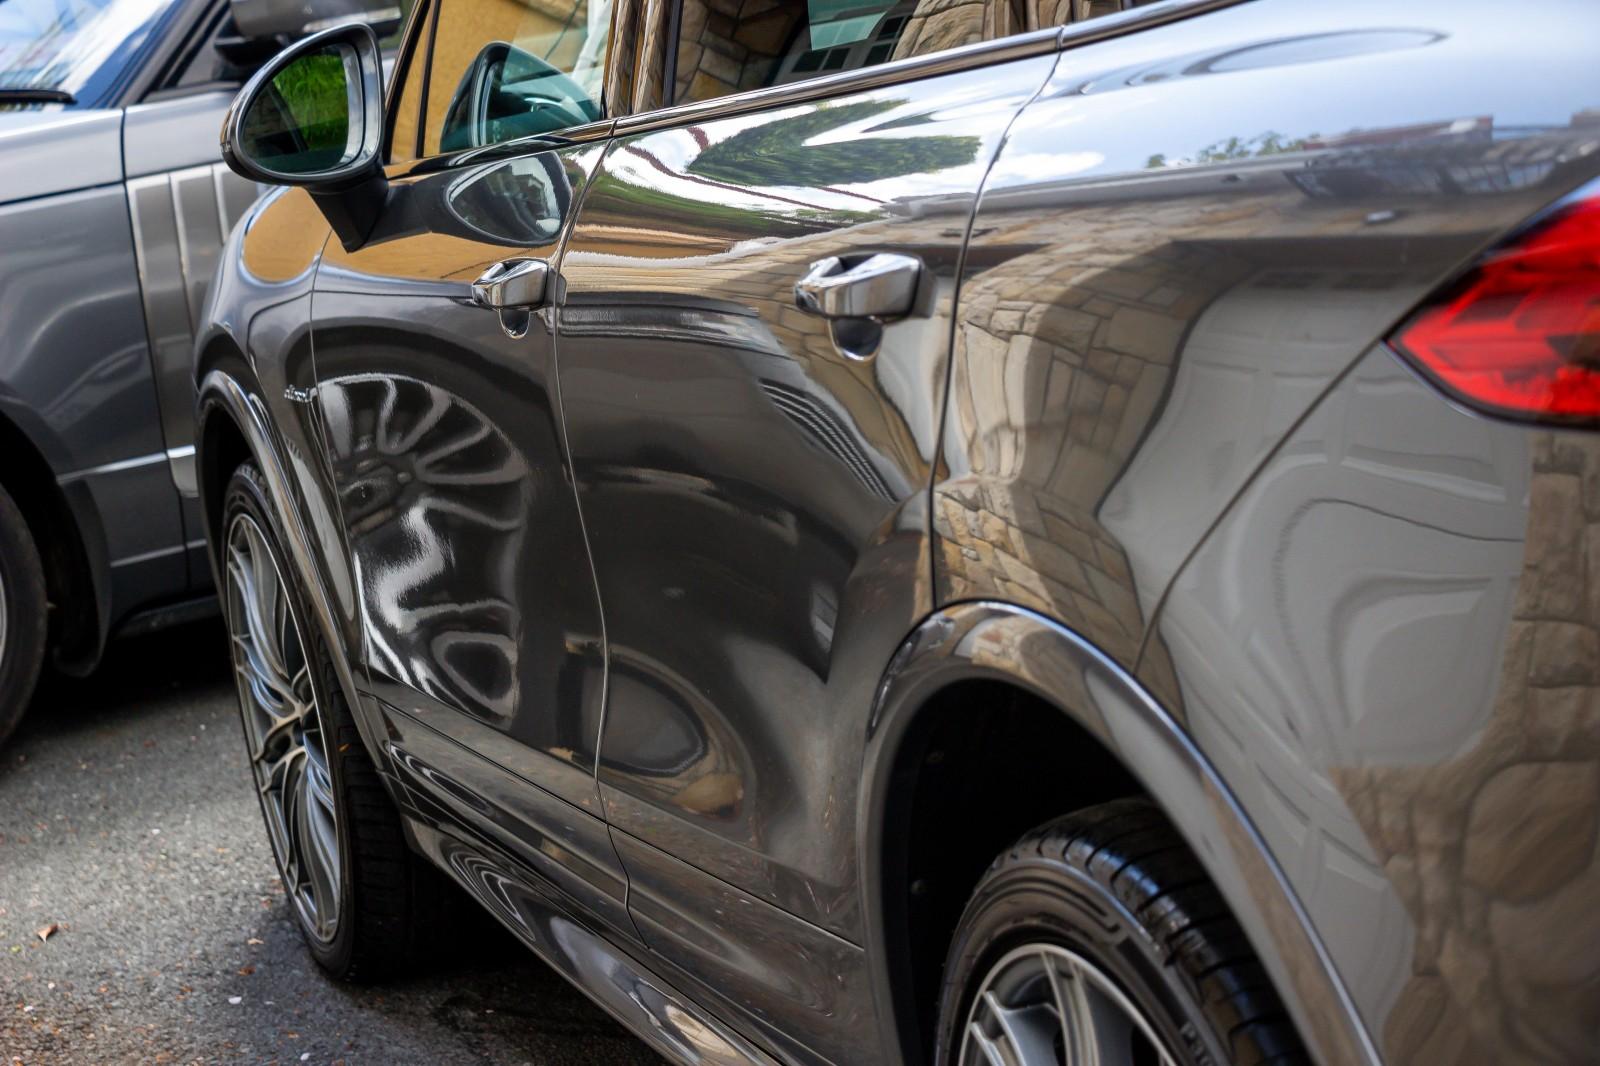 2015 Porsche Cayenne 3.0D V6 TIPTRONIC S Diesel Automatic – Morgan Cars 9 Mound Road, Warrenpoint, Newry BT34 3LW, UK full